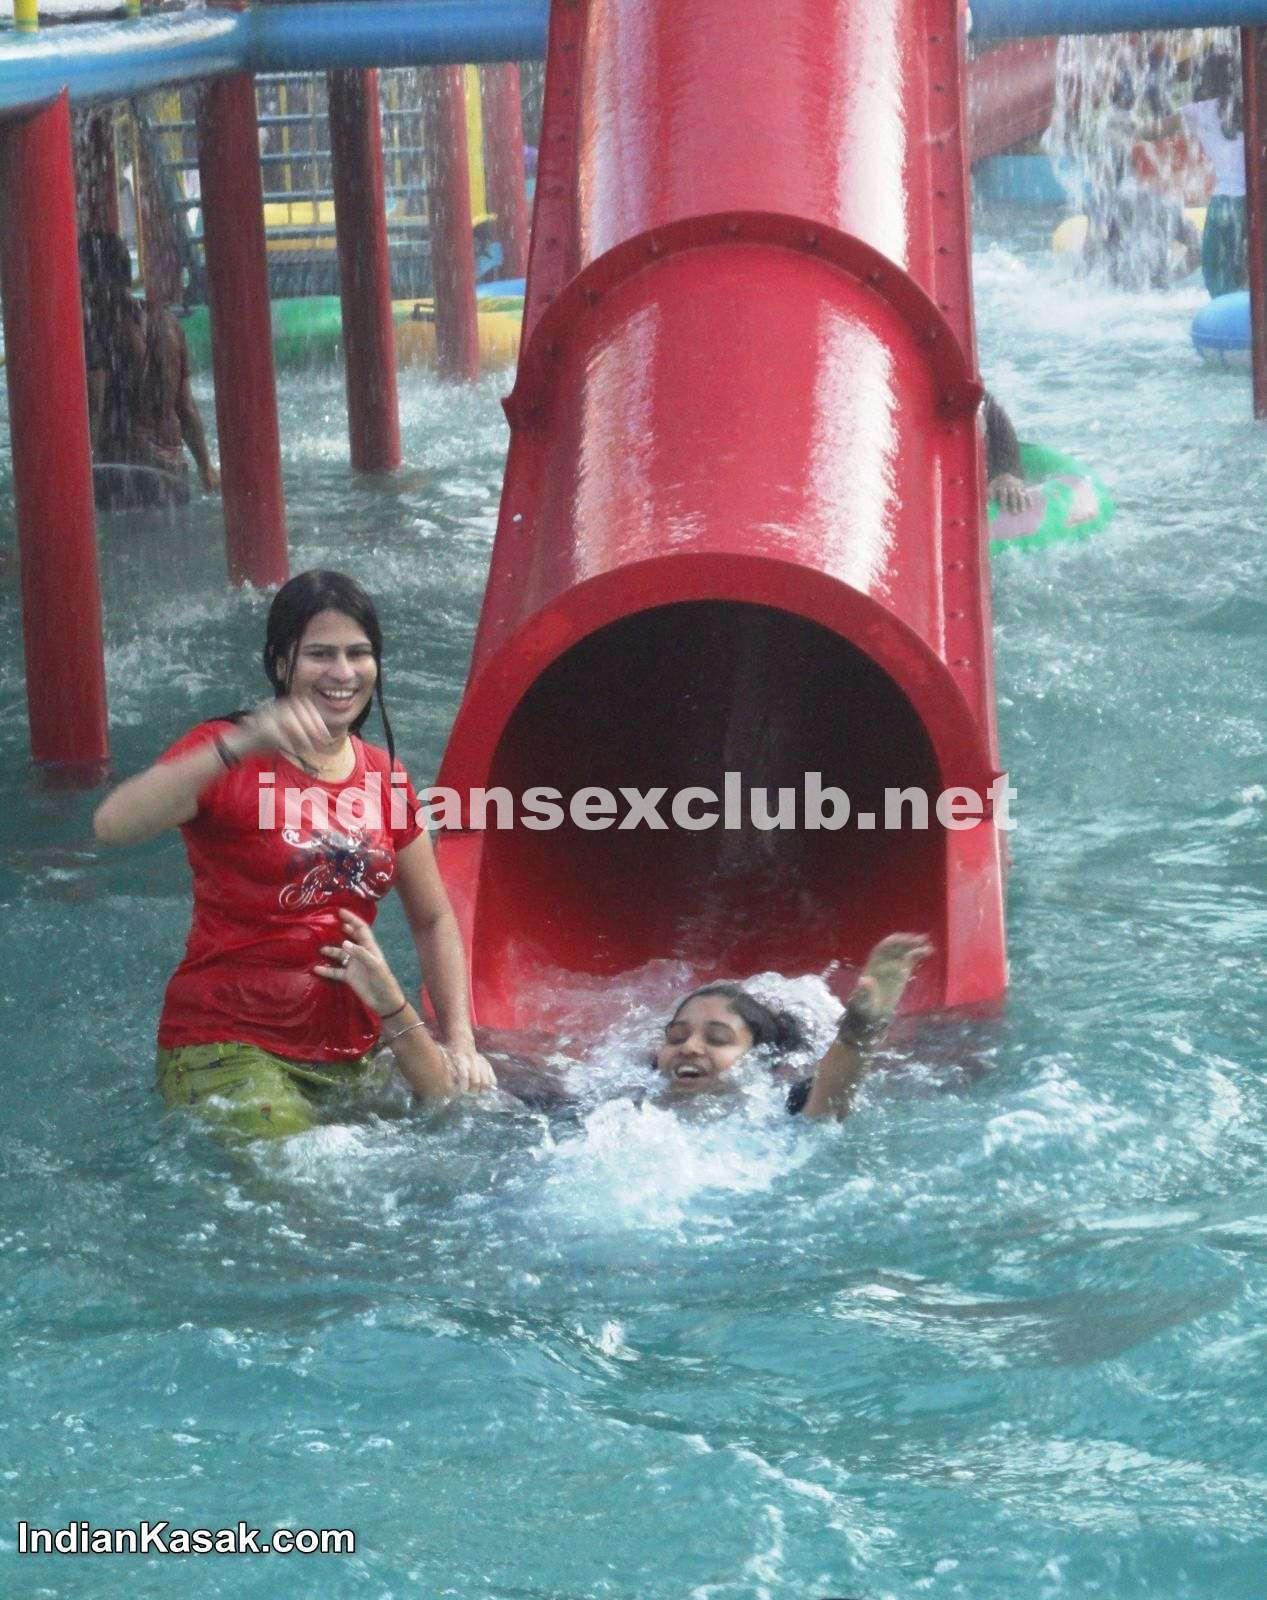 Water at hot park girls